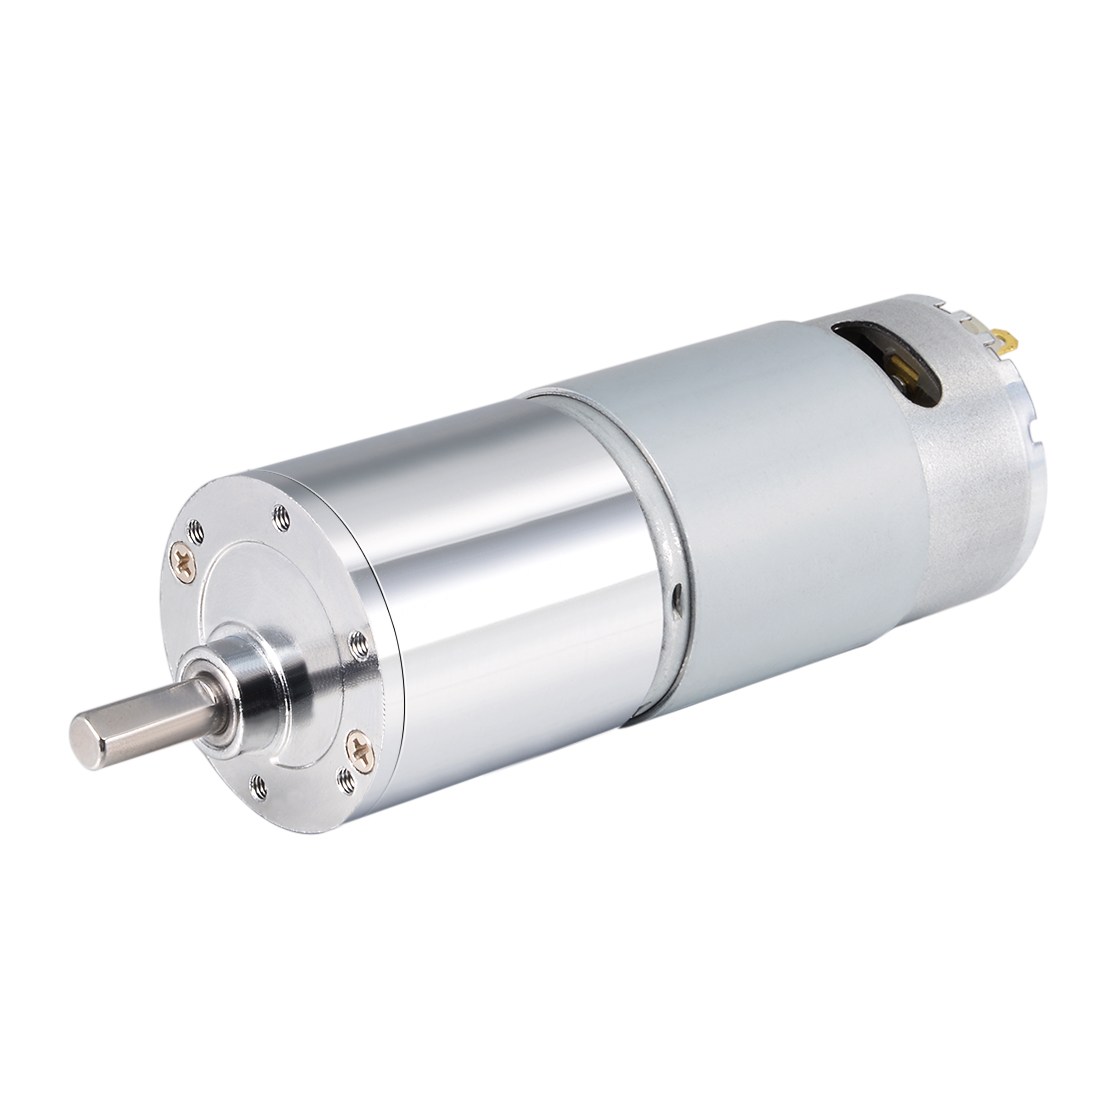 12V DC 10 RPM Gear Motor High Torque Reduction Gearbox Eccentric Output Shaft